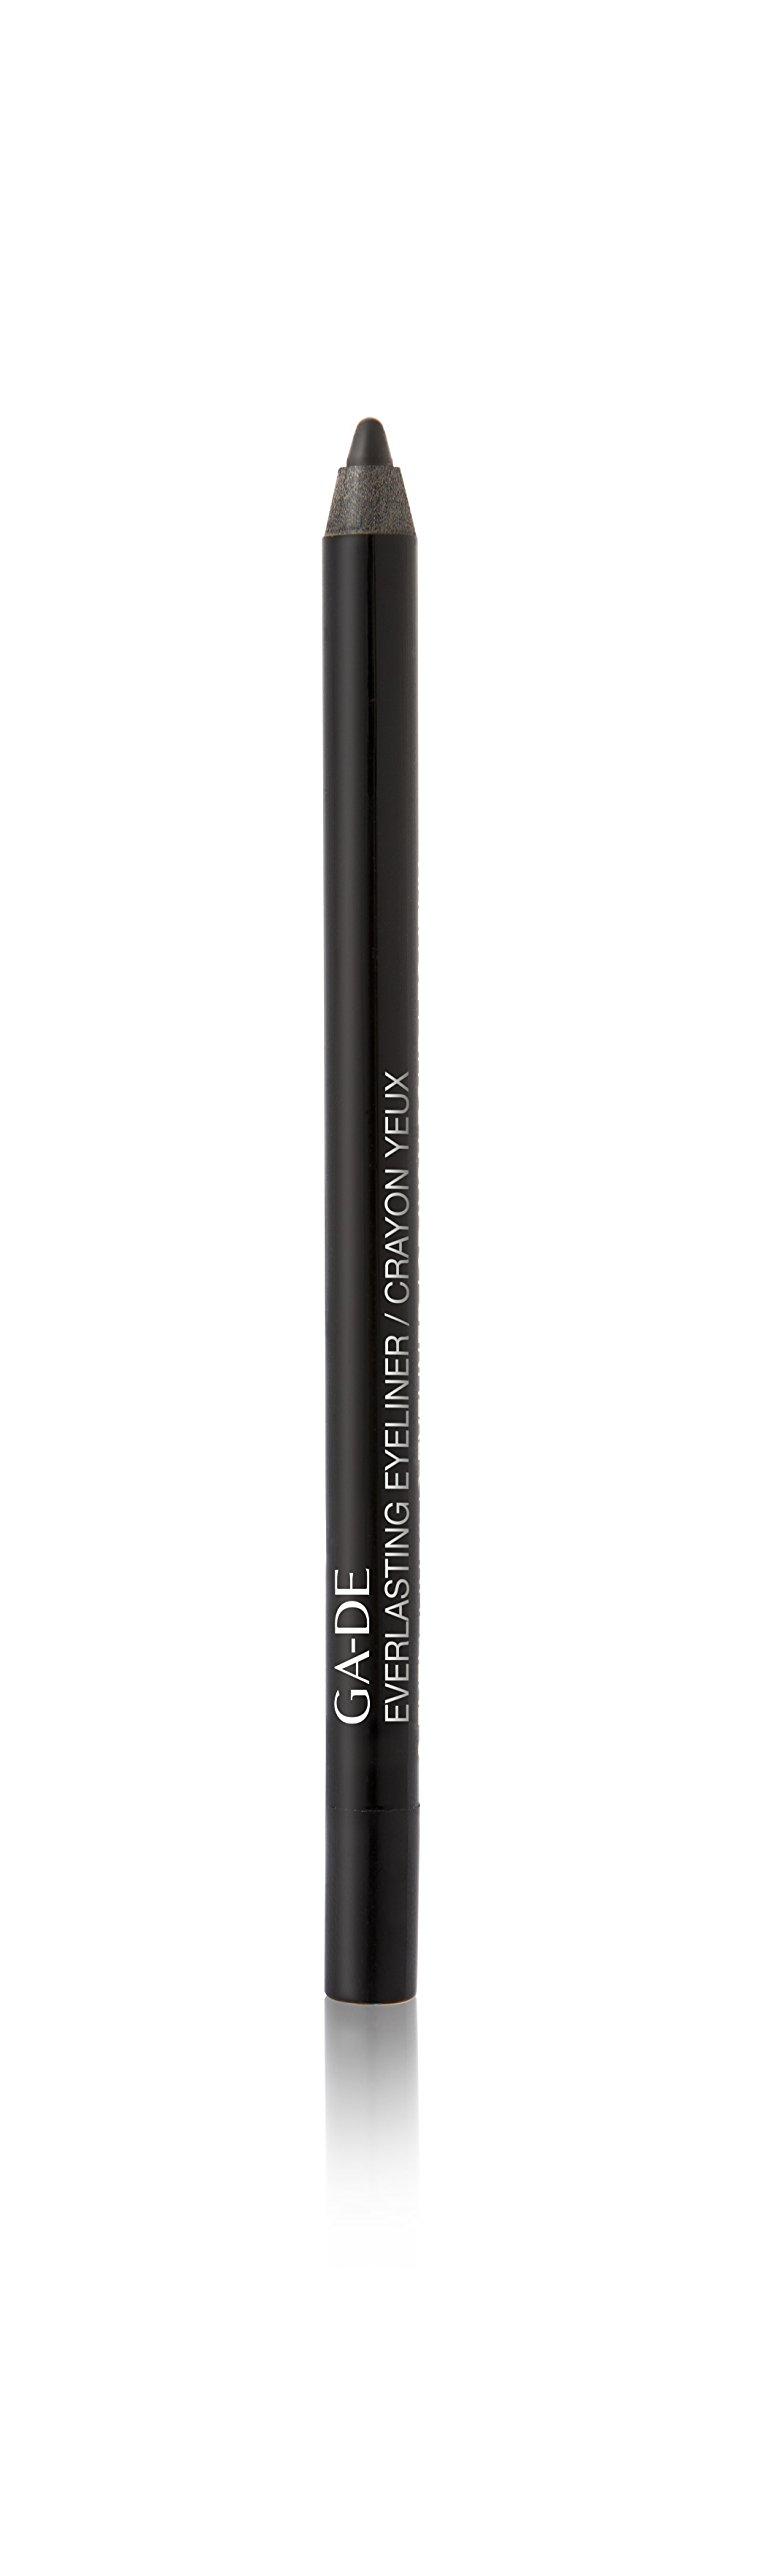 Everlasting Eyeliner By GA-DE COSMETICS (Intense Black No.300)